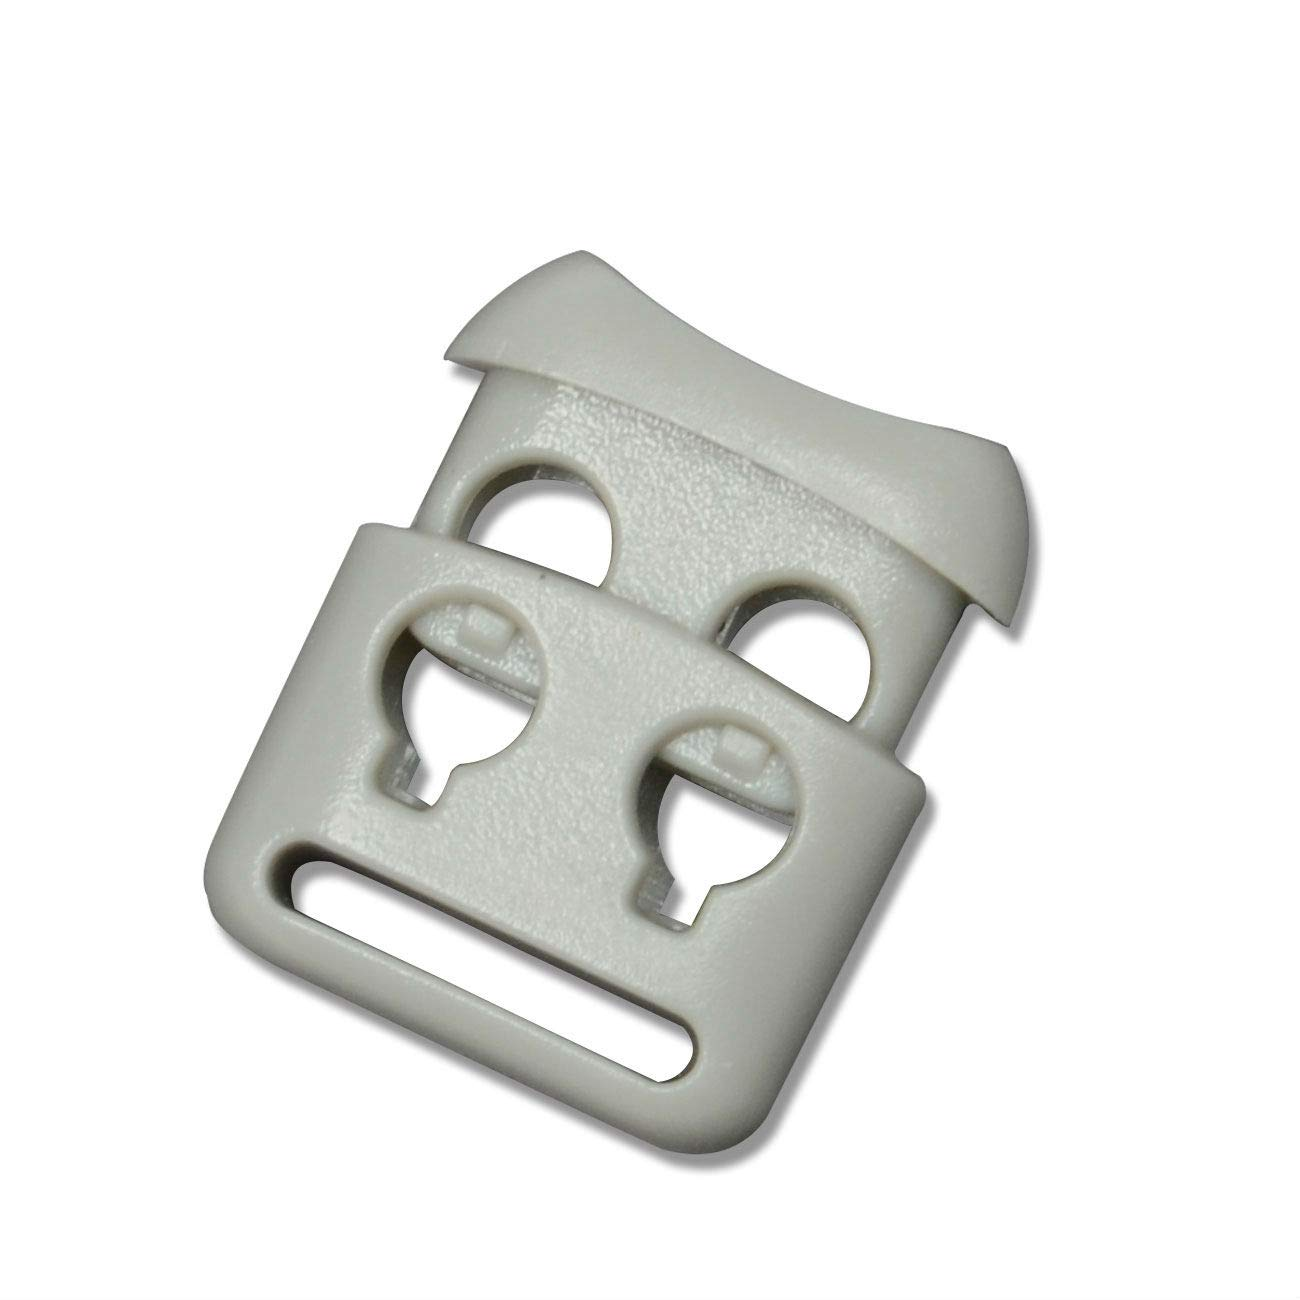 Double Hole Plastic Cord Locks End Spring Stop Toggle Stoppers Multi-Colour 20 PCS, Khaki